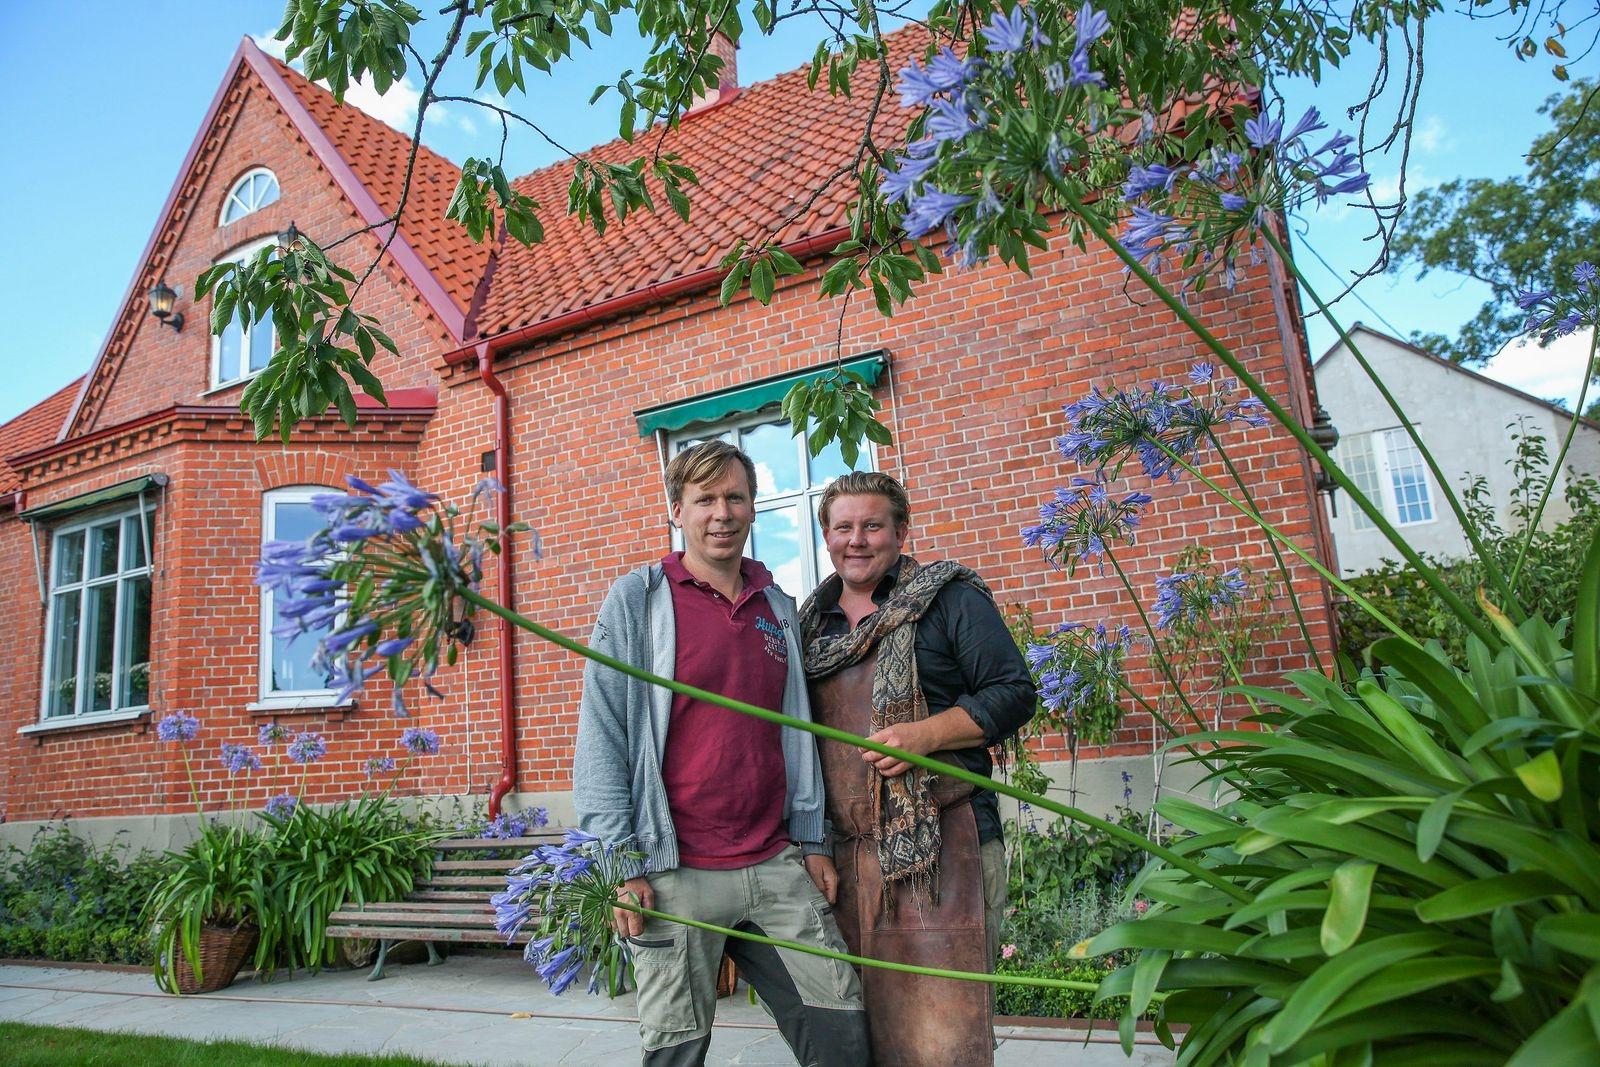 Blomsterkungarna Petter Kjellén och Karl Fredrik Gustafsson kunde i augusti pusta ut efter en minst sagt hektisk sommar på Eklaholm.